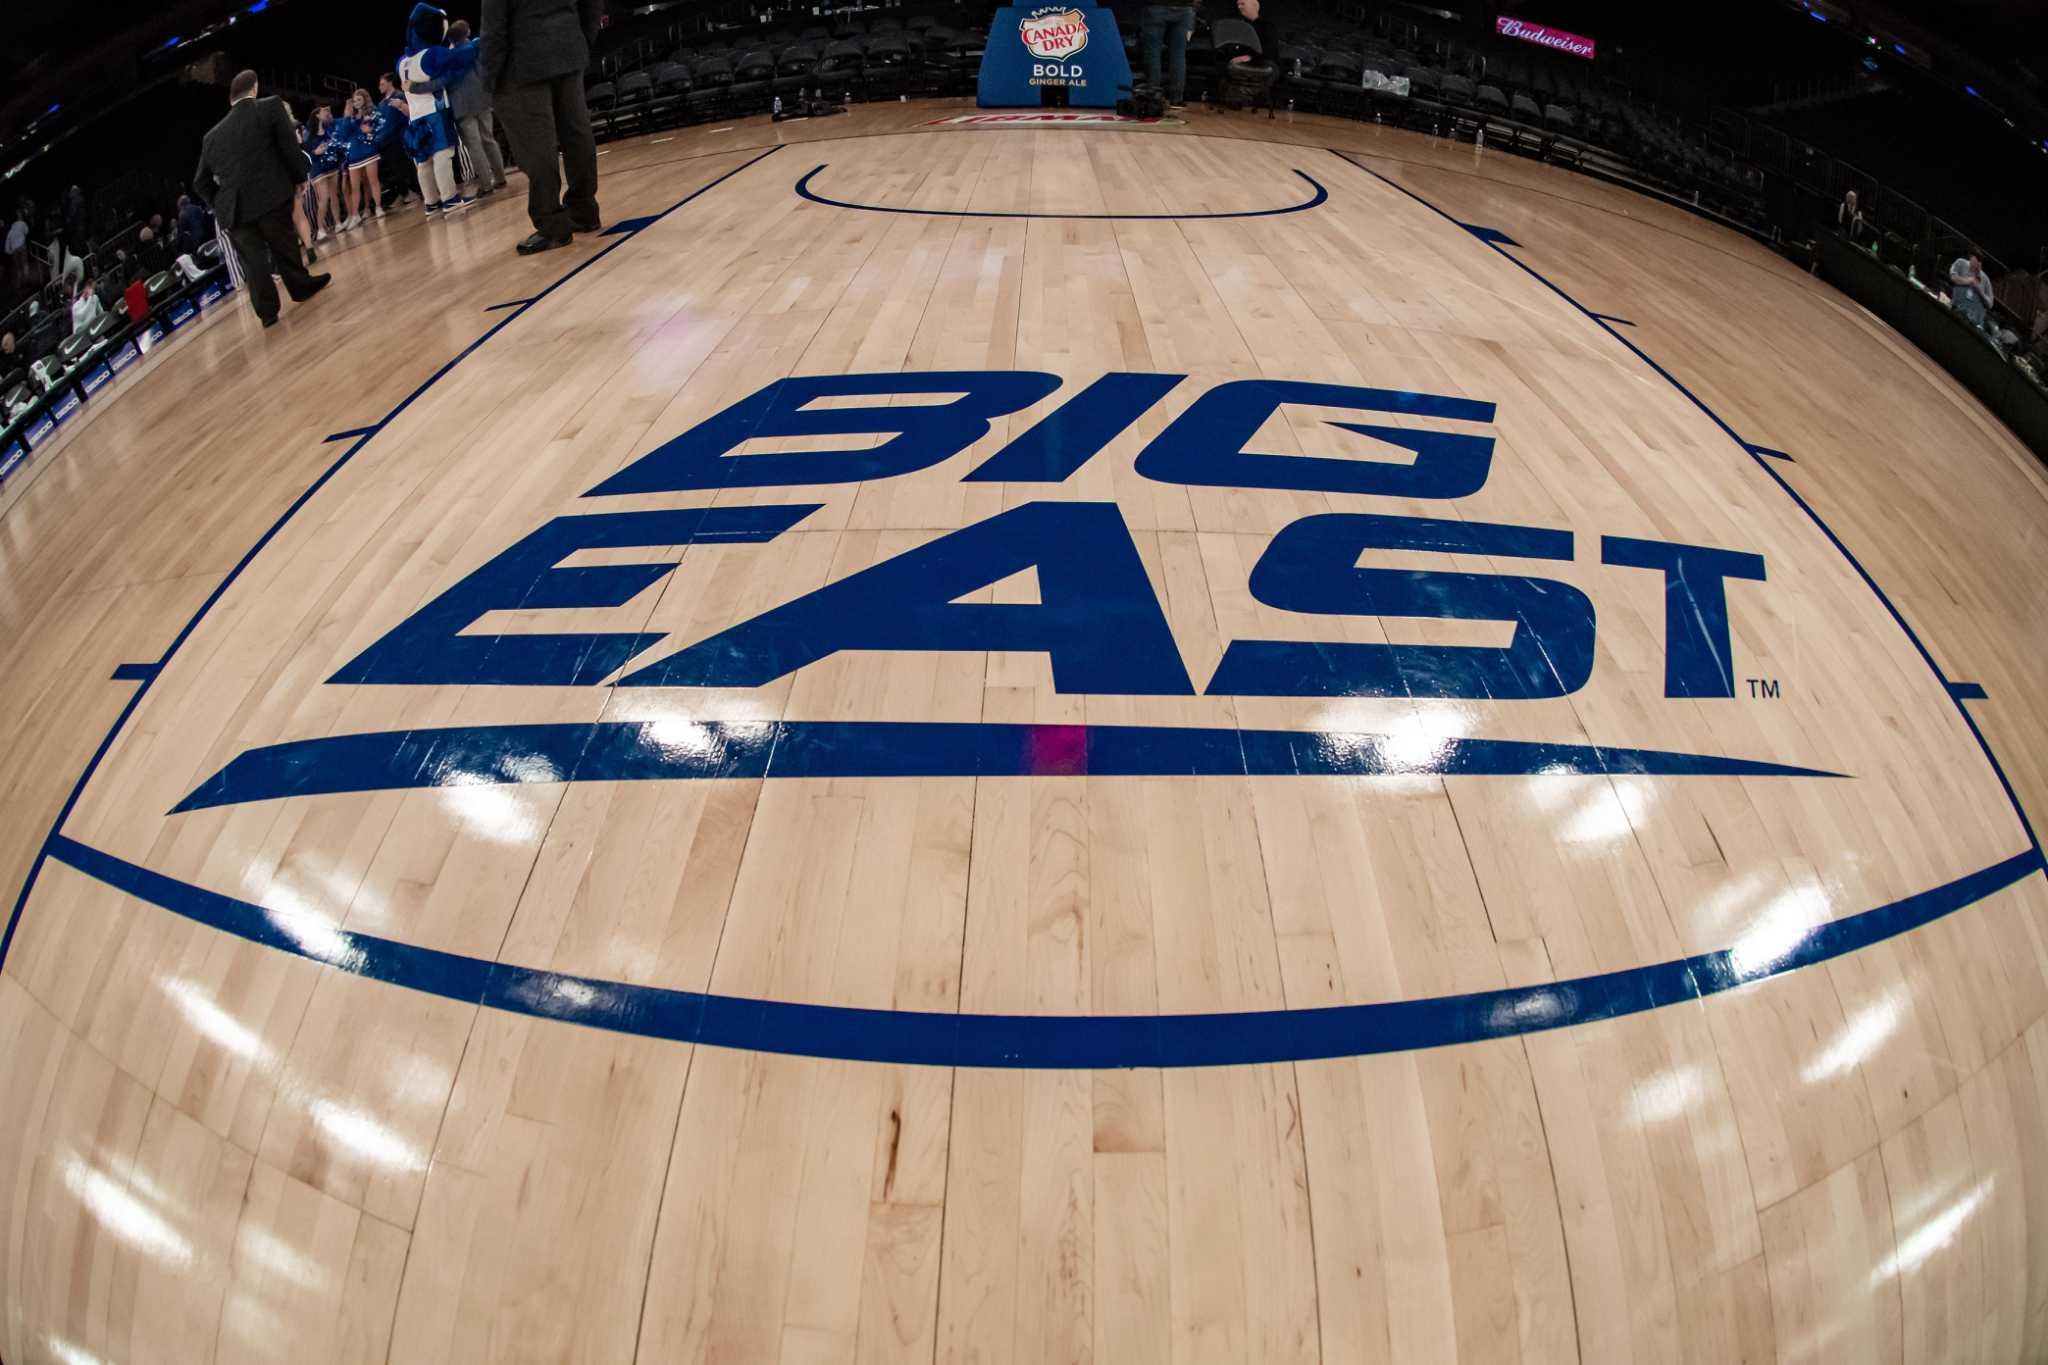 Longtime Big East writer Kevin McNamara joins Hearst CT Media's UConn men's basketball podcast